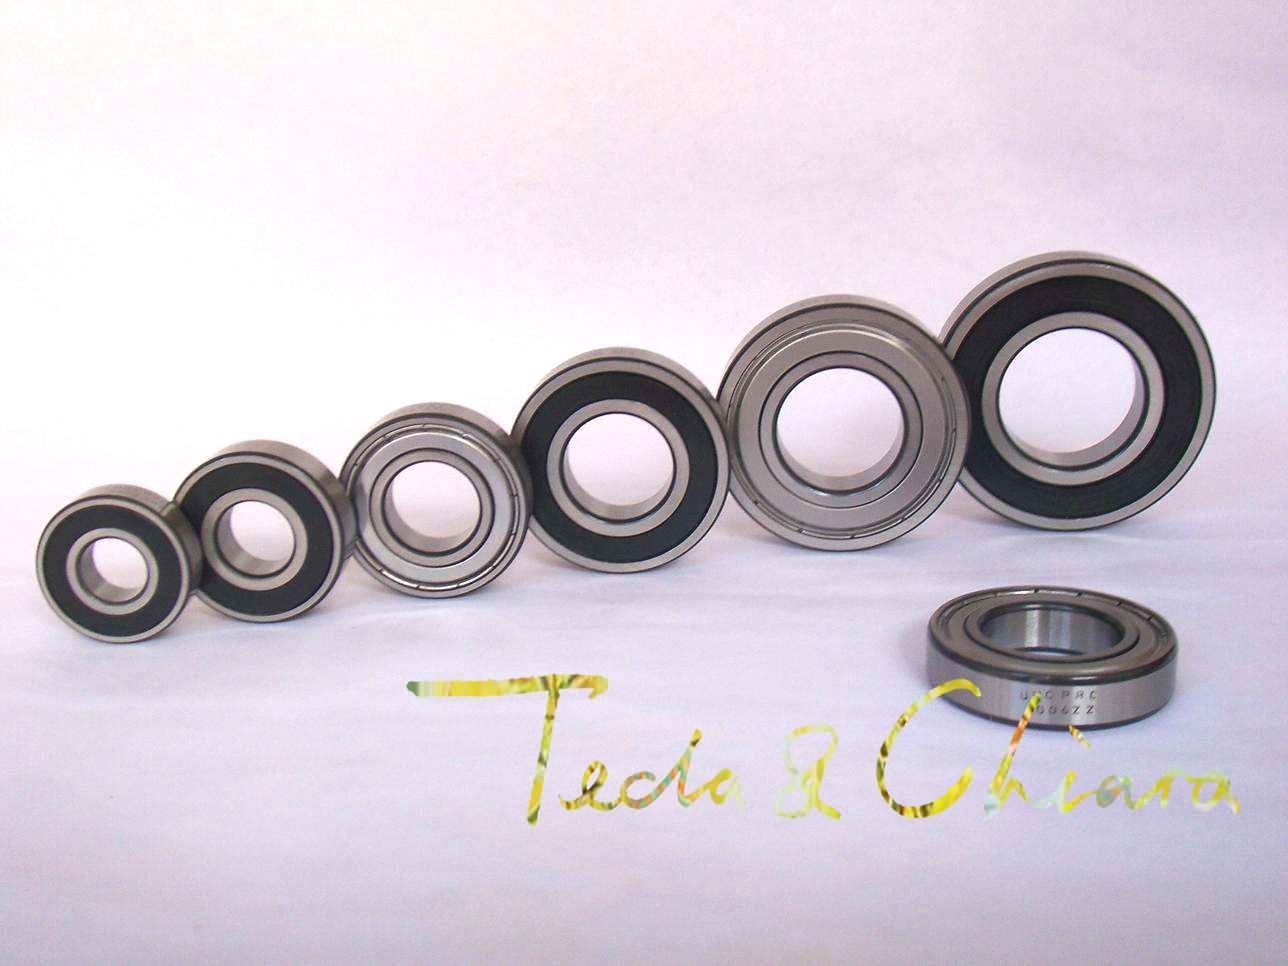 6900 6900ZZ 6900RS 6900-2Z 6900Z 6900-2RS ZZ RS RZ 2RZ Deep Groove Ball Bearings 10 x 22 x 6mm High Quality